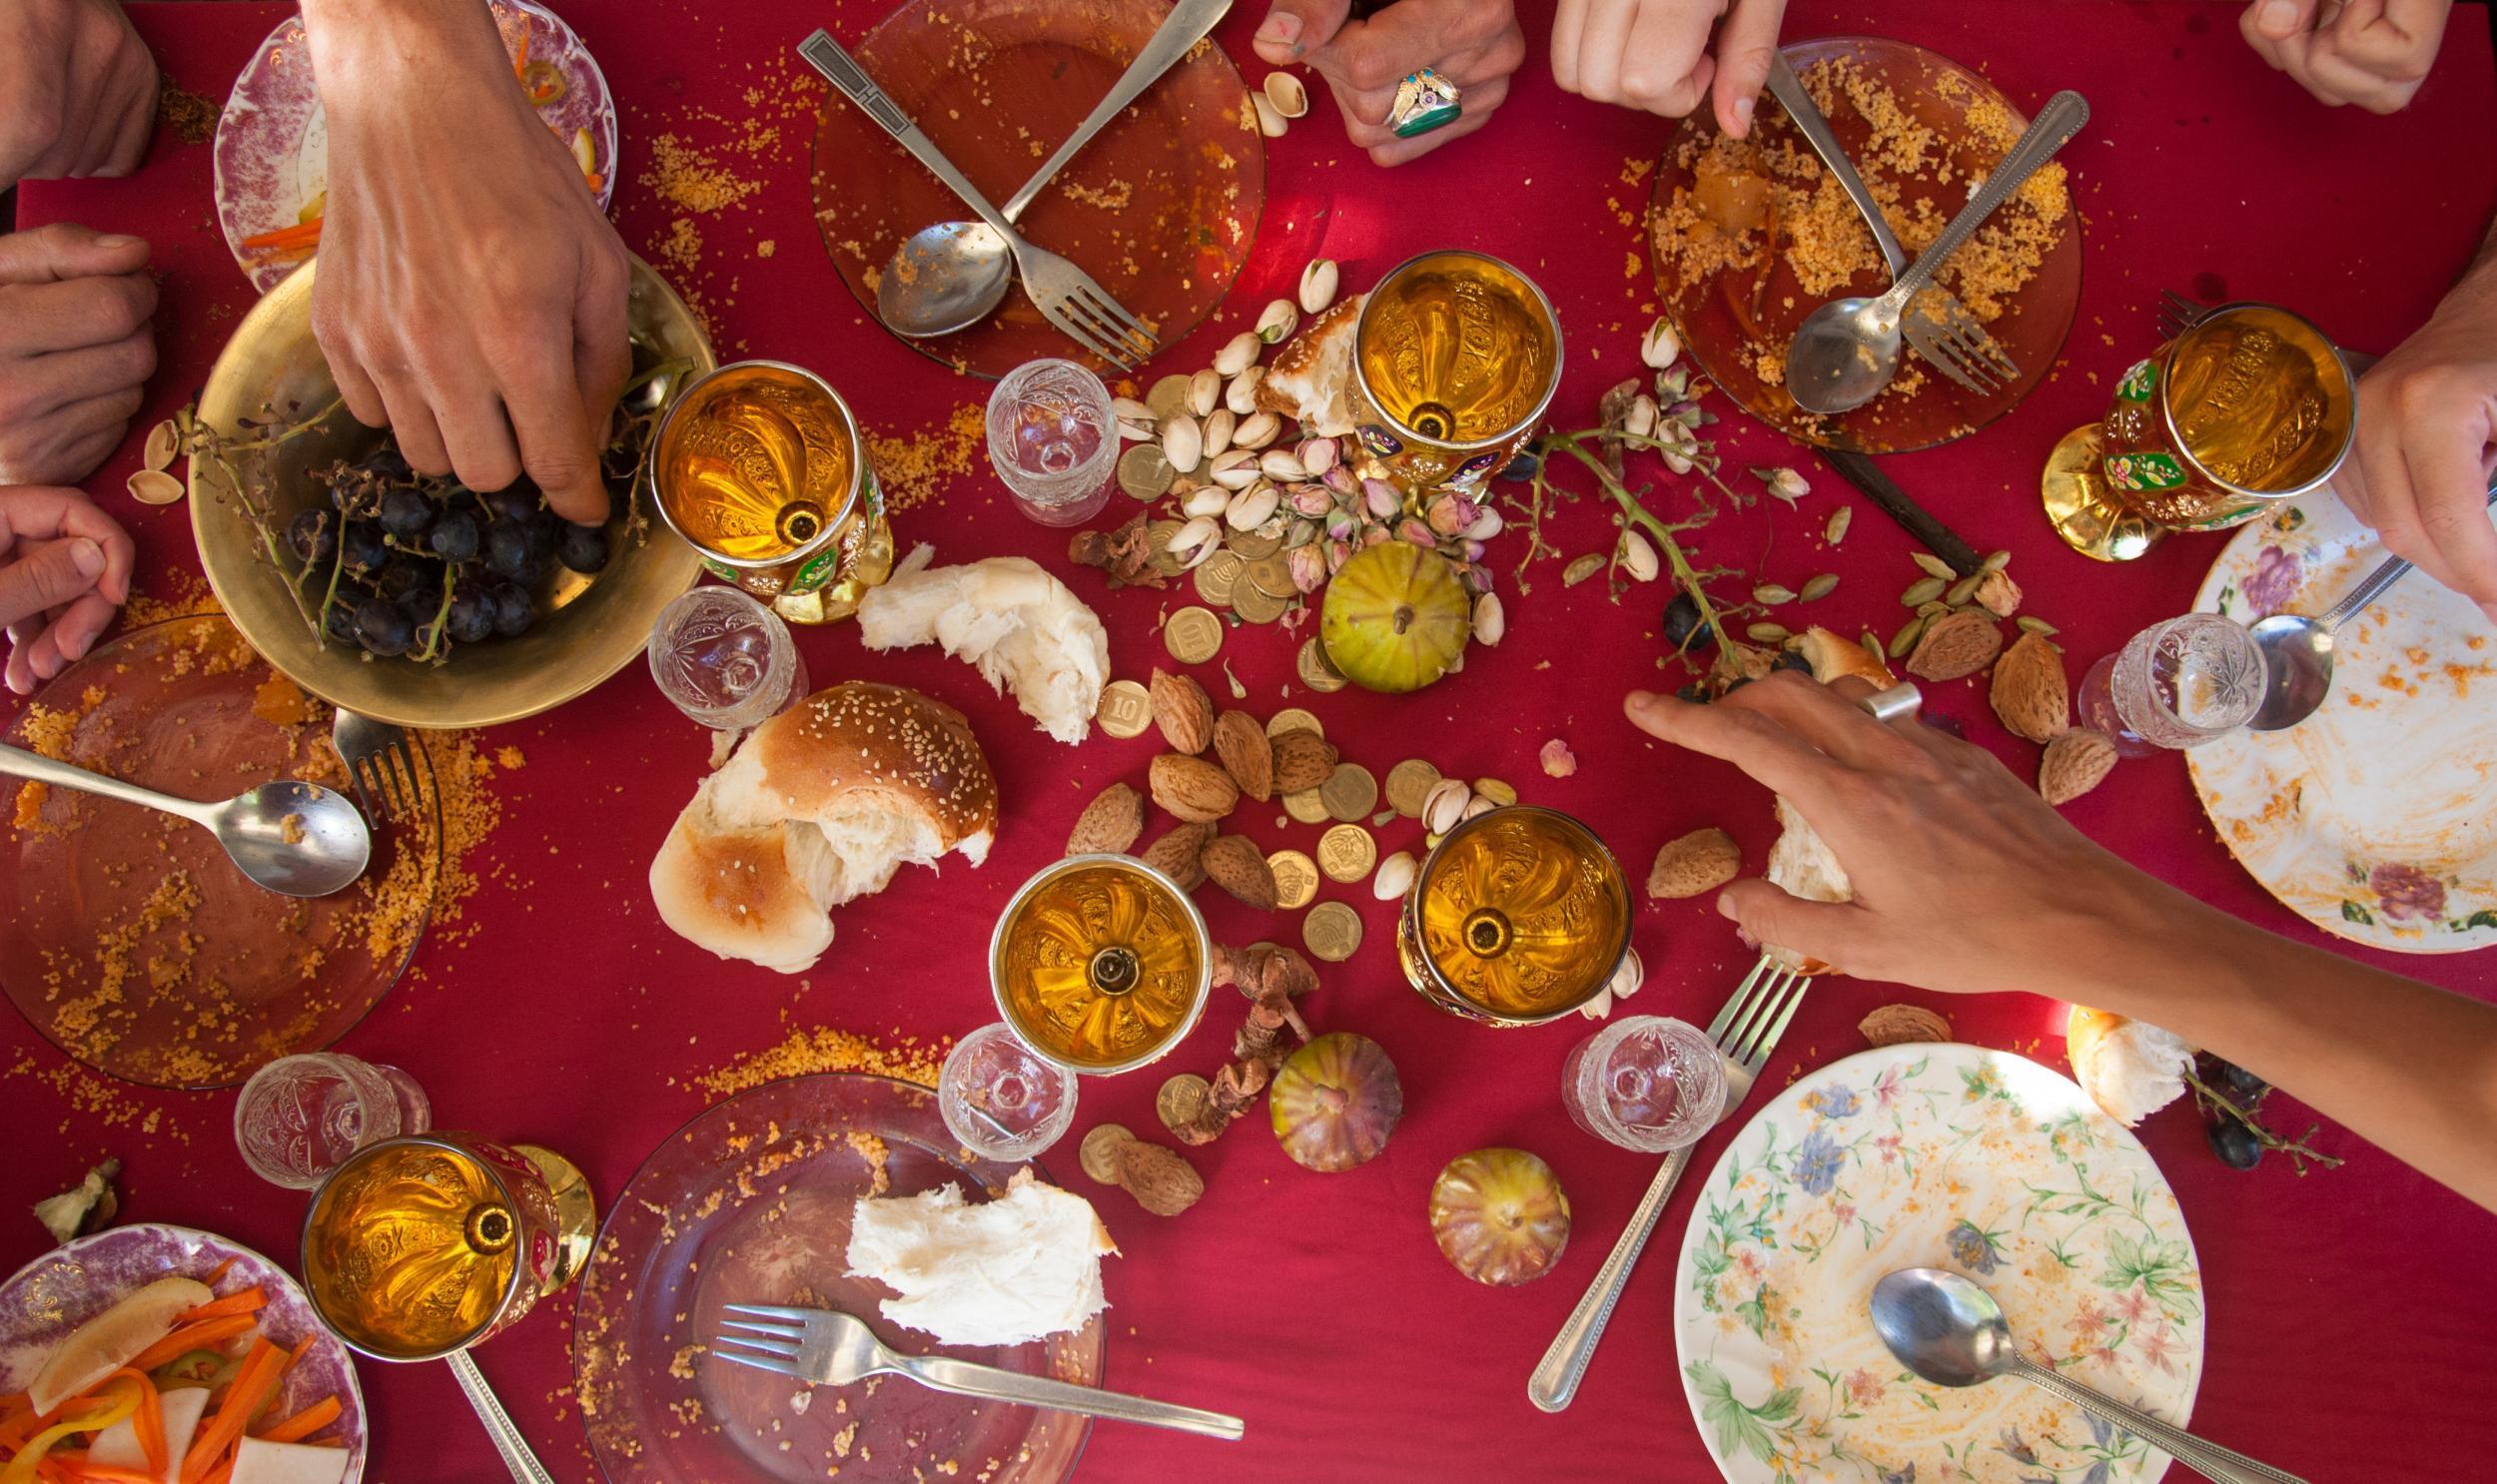 How Tel Aviv became the vegan capital of the world